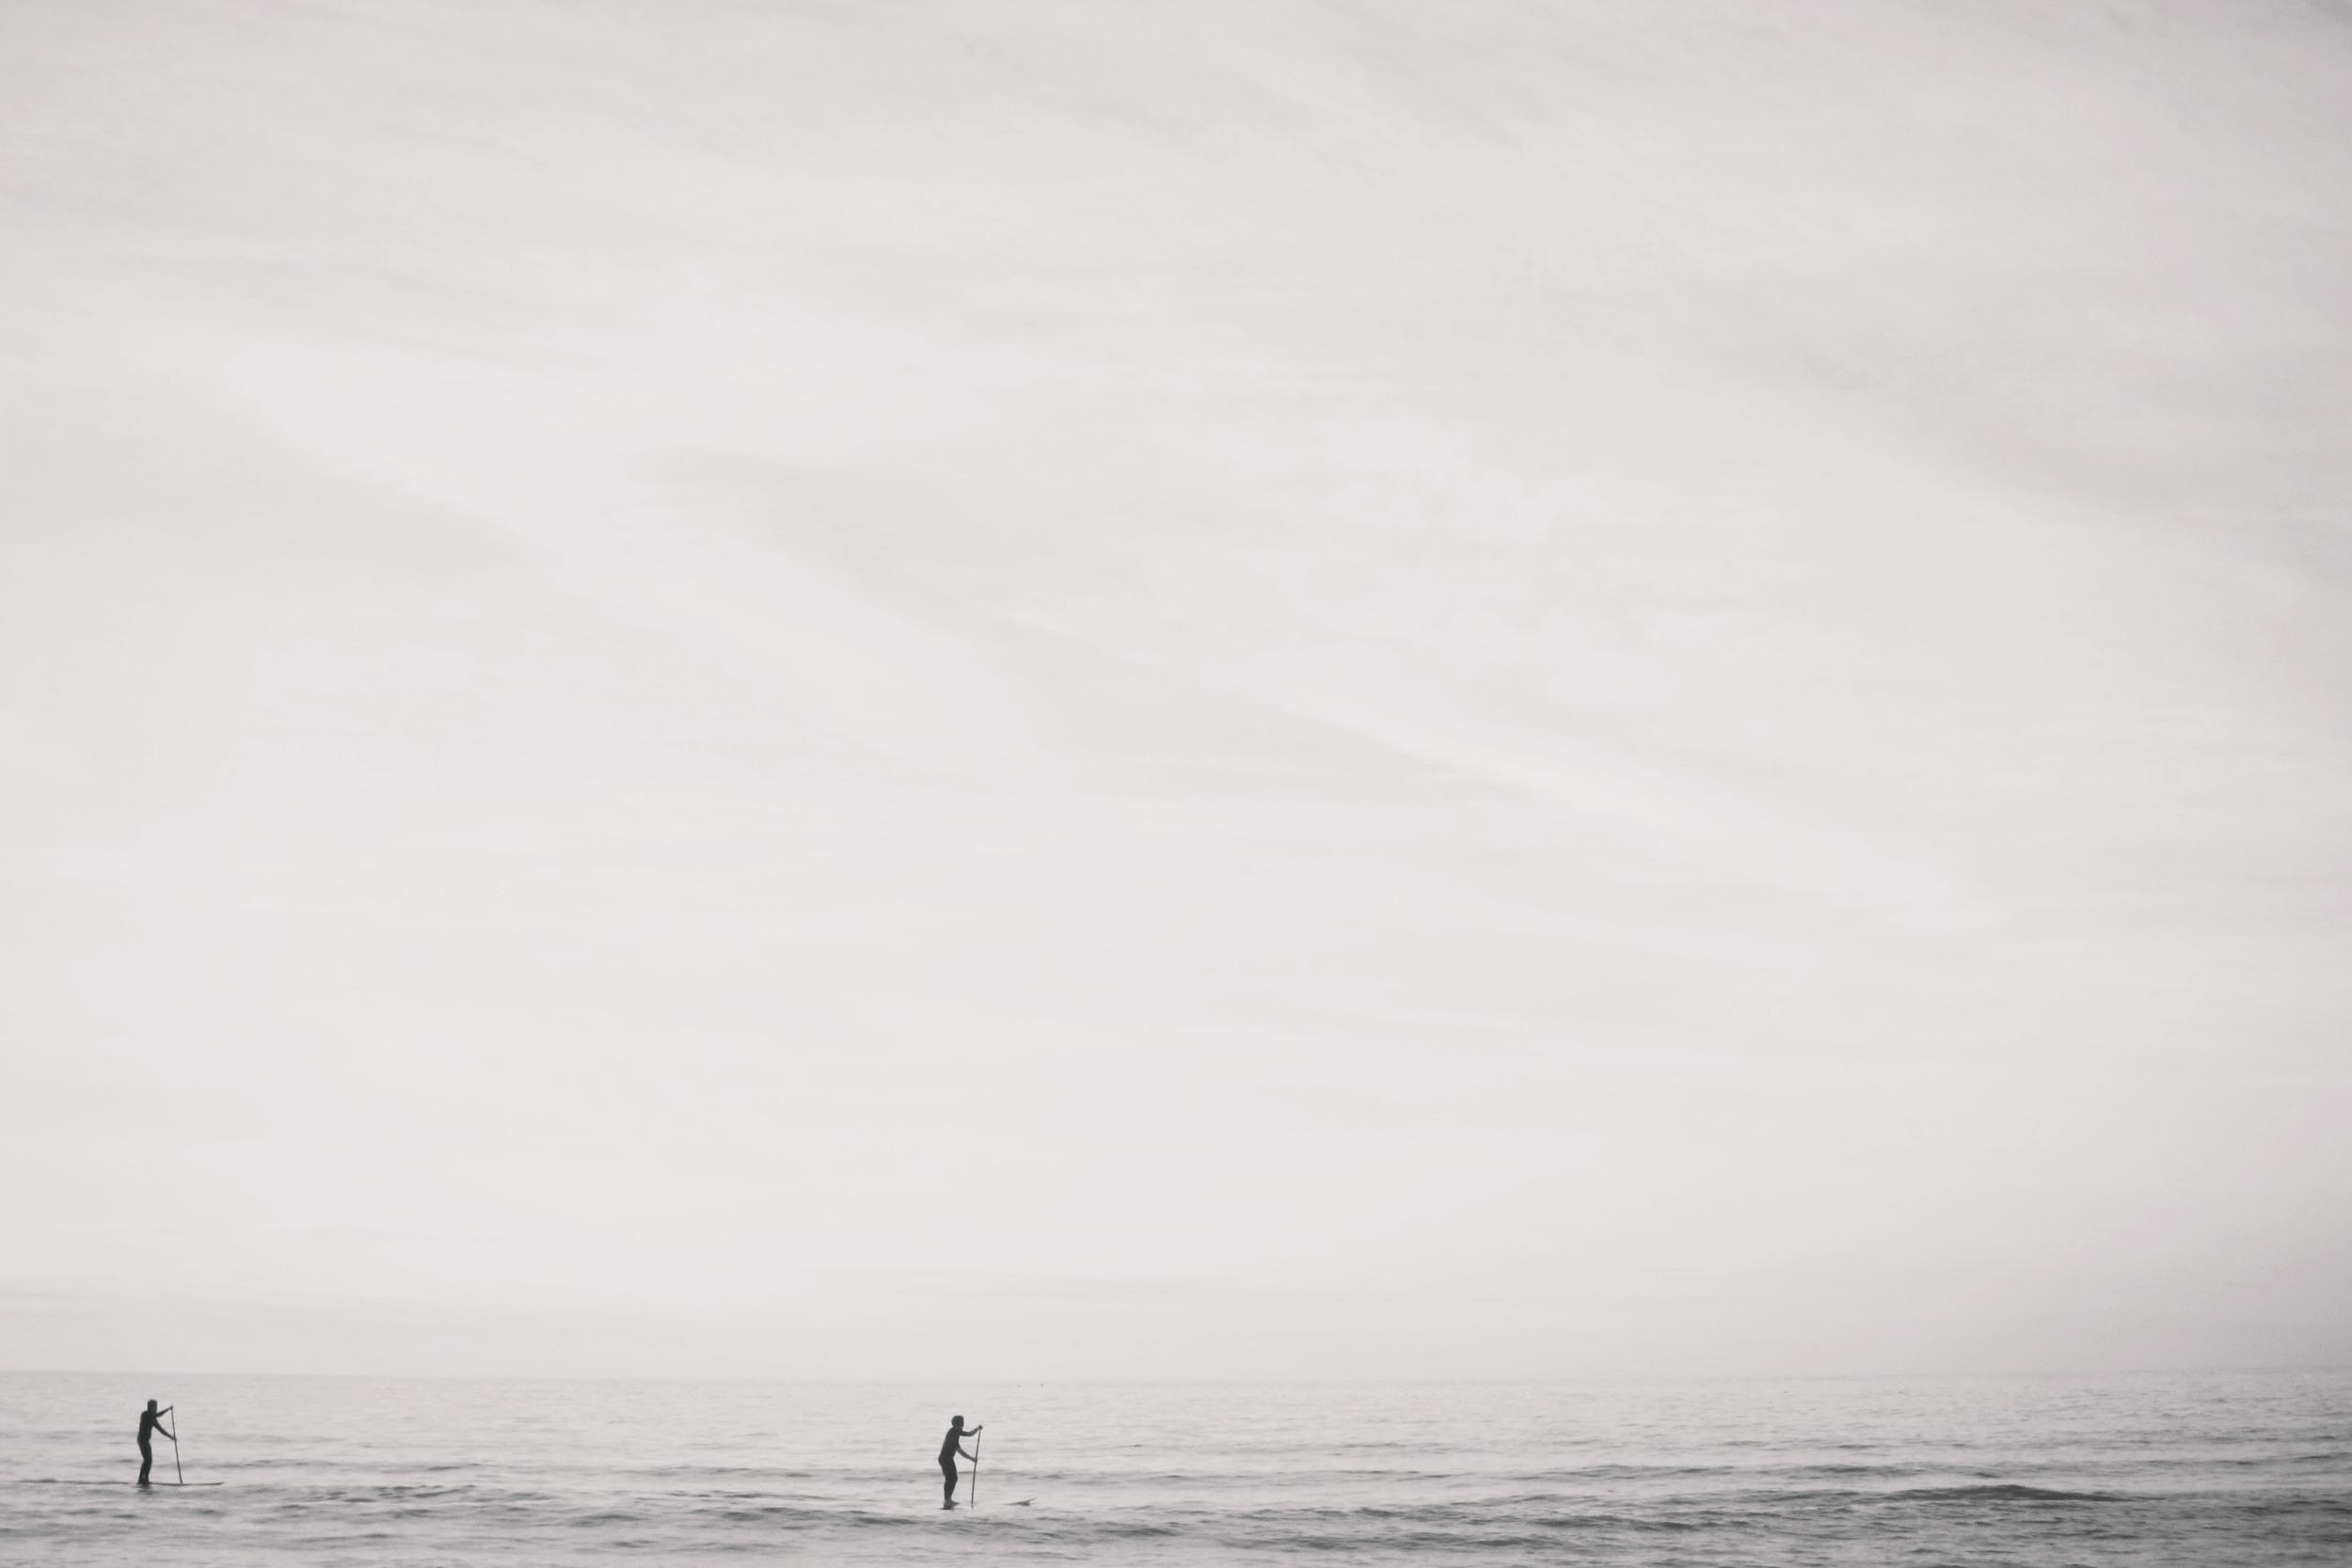 AW_Surf16a.jpg